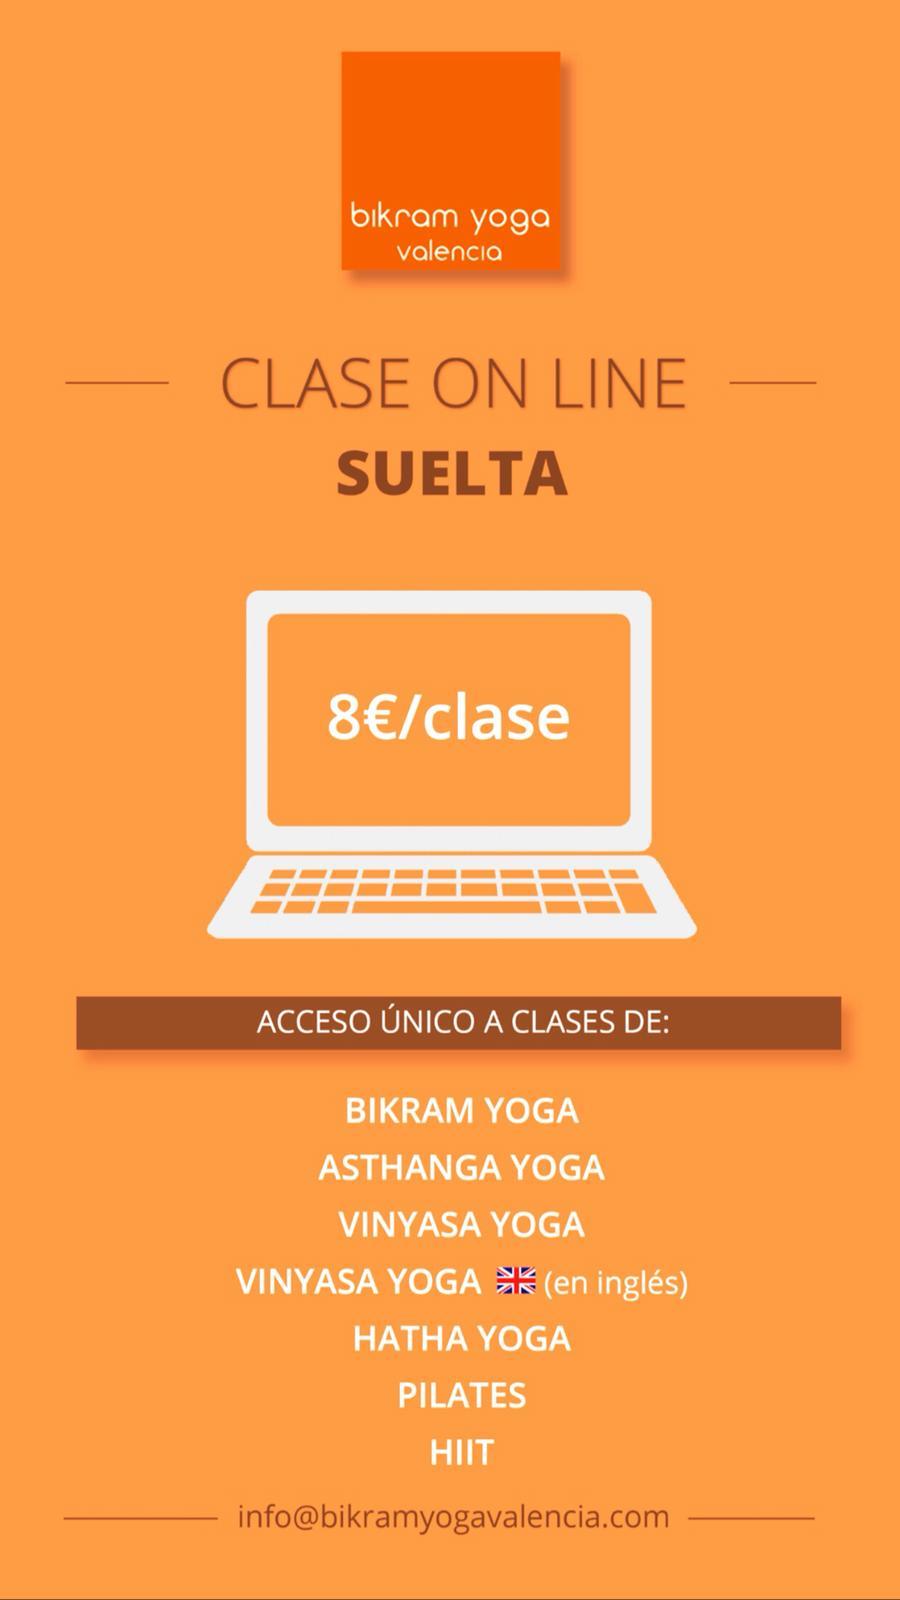 clases yoga online bikram yoga valencia